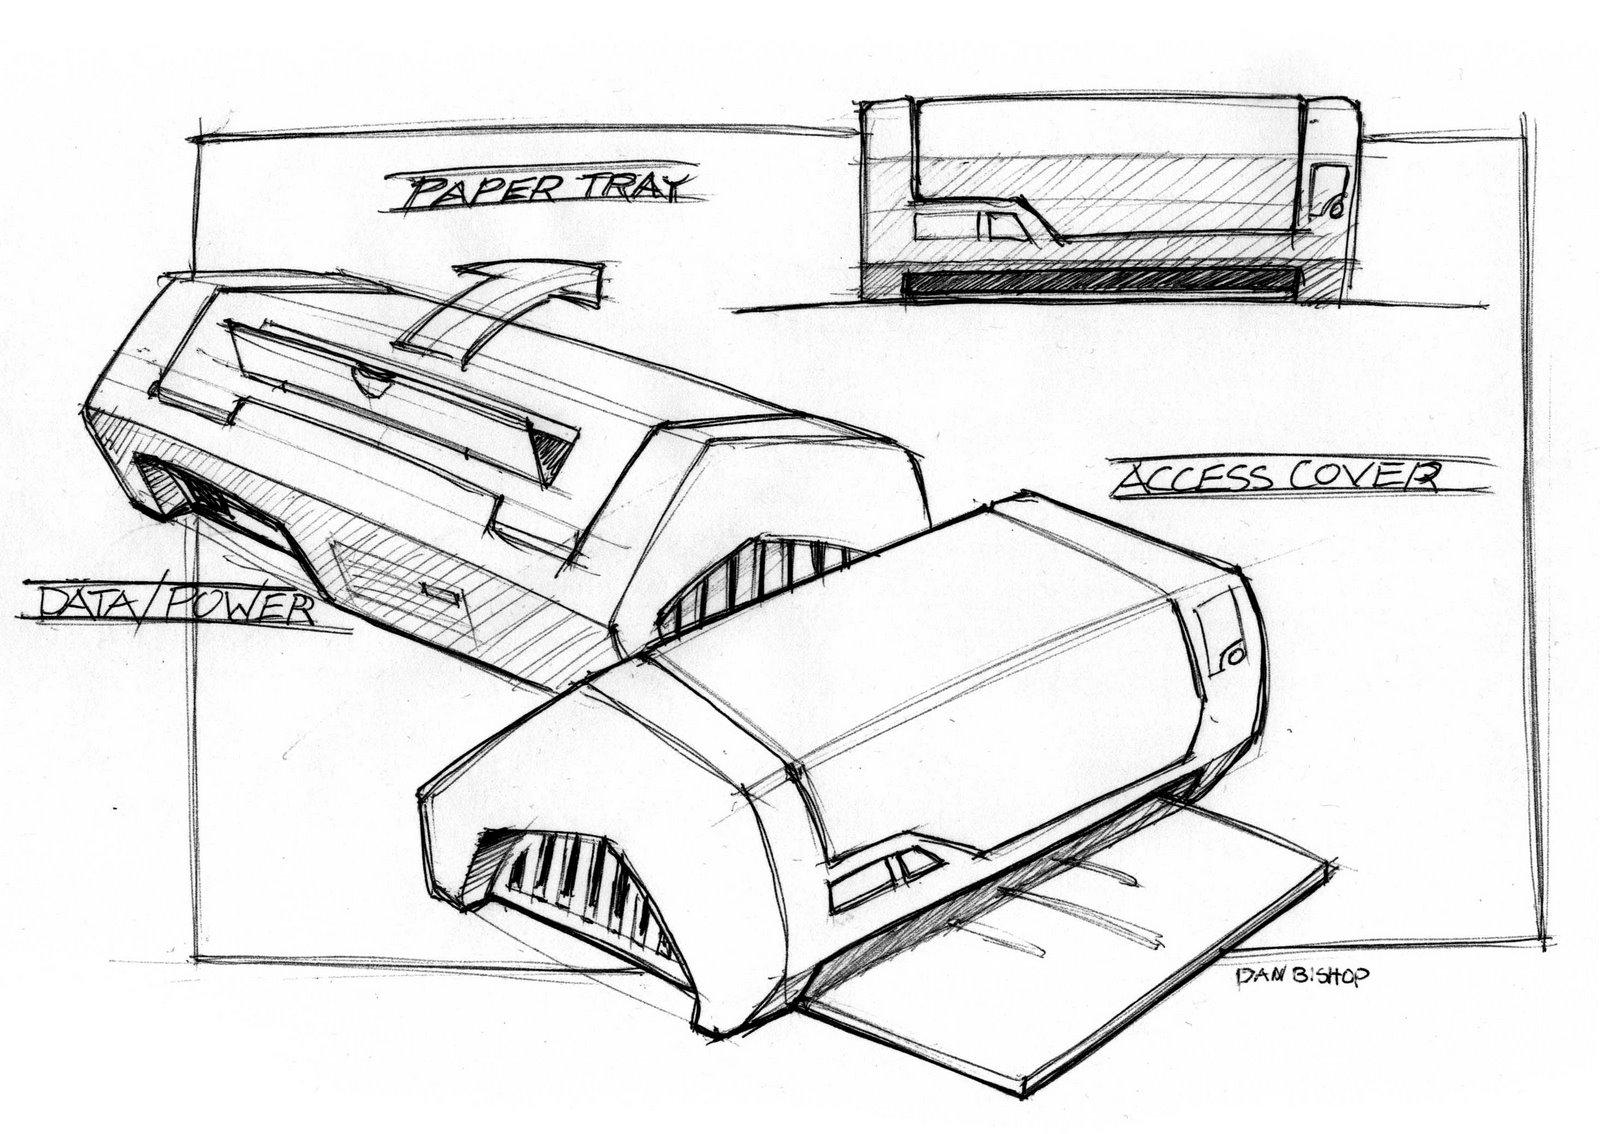 Sketches by Dan Bishop at Coroflot.com